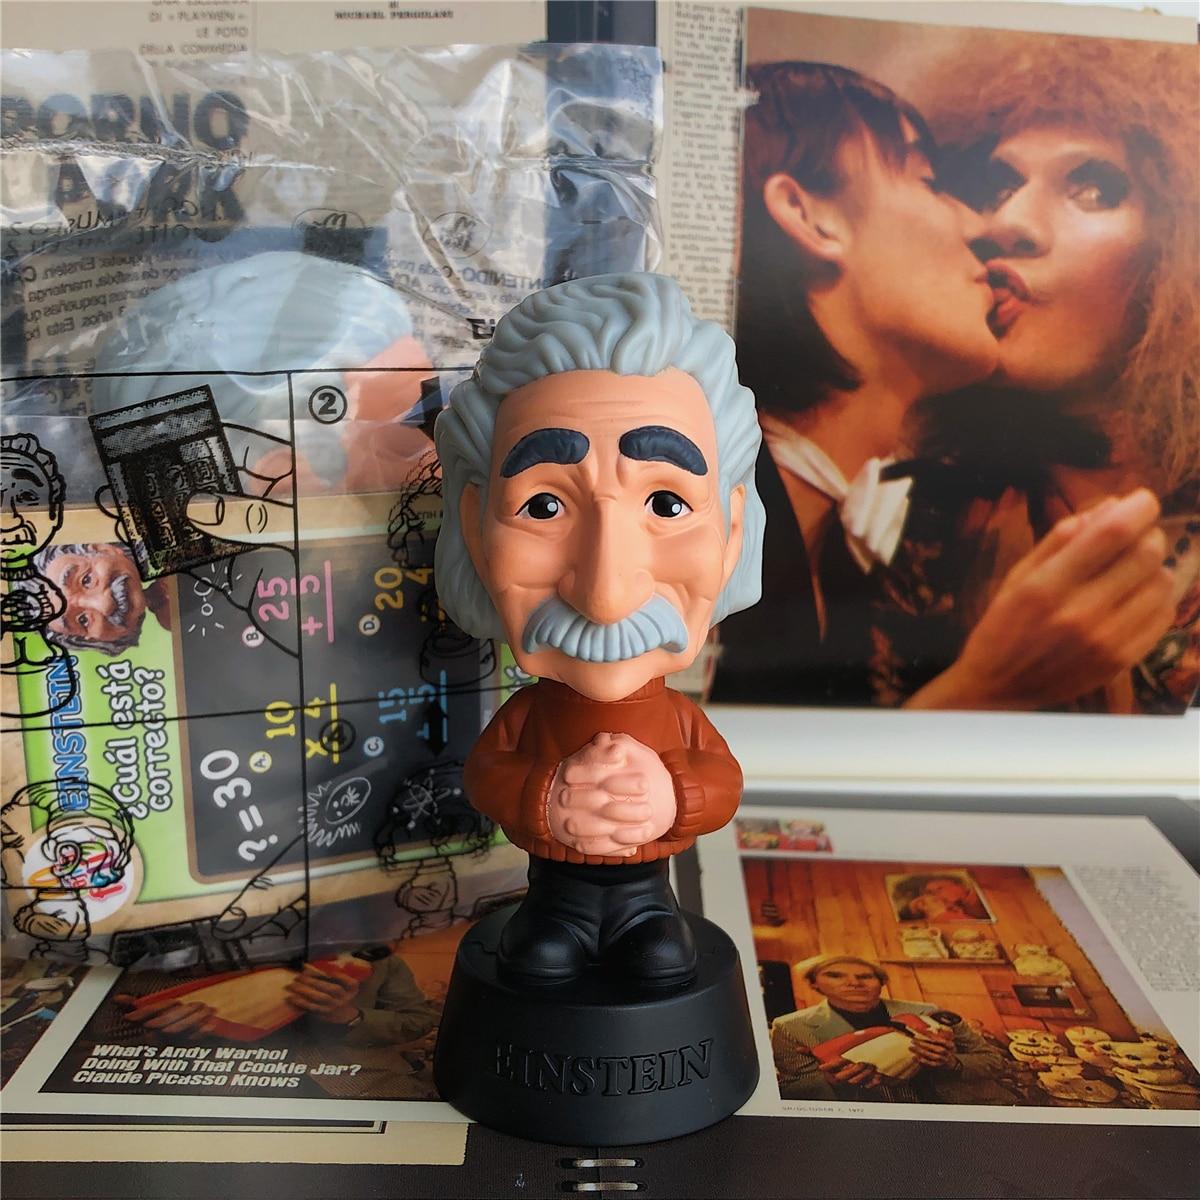 Original Garage Kid 10cm Action Figure Albert Einstein Scientist Mini Doll Loose Toy Figure Model Collectible Model Toy Gifts